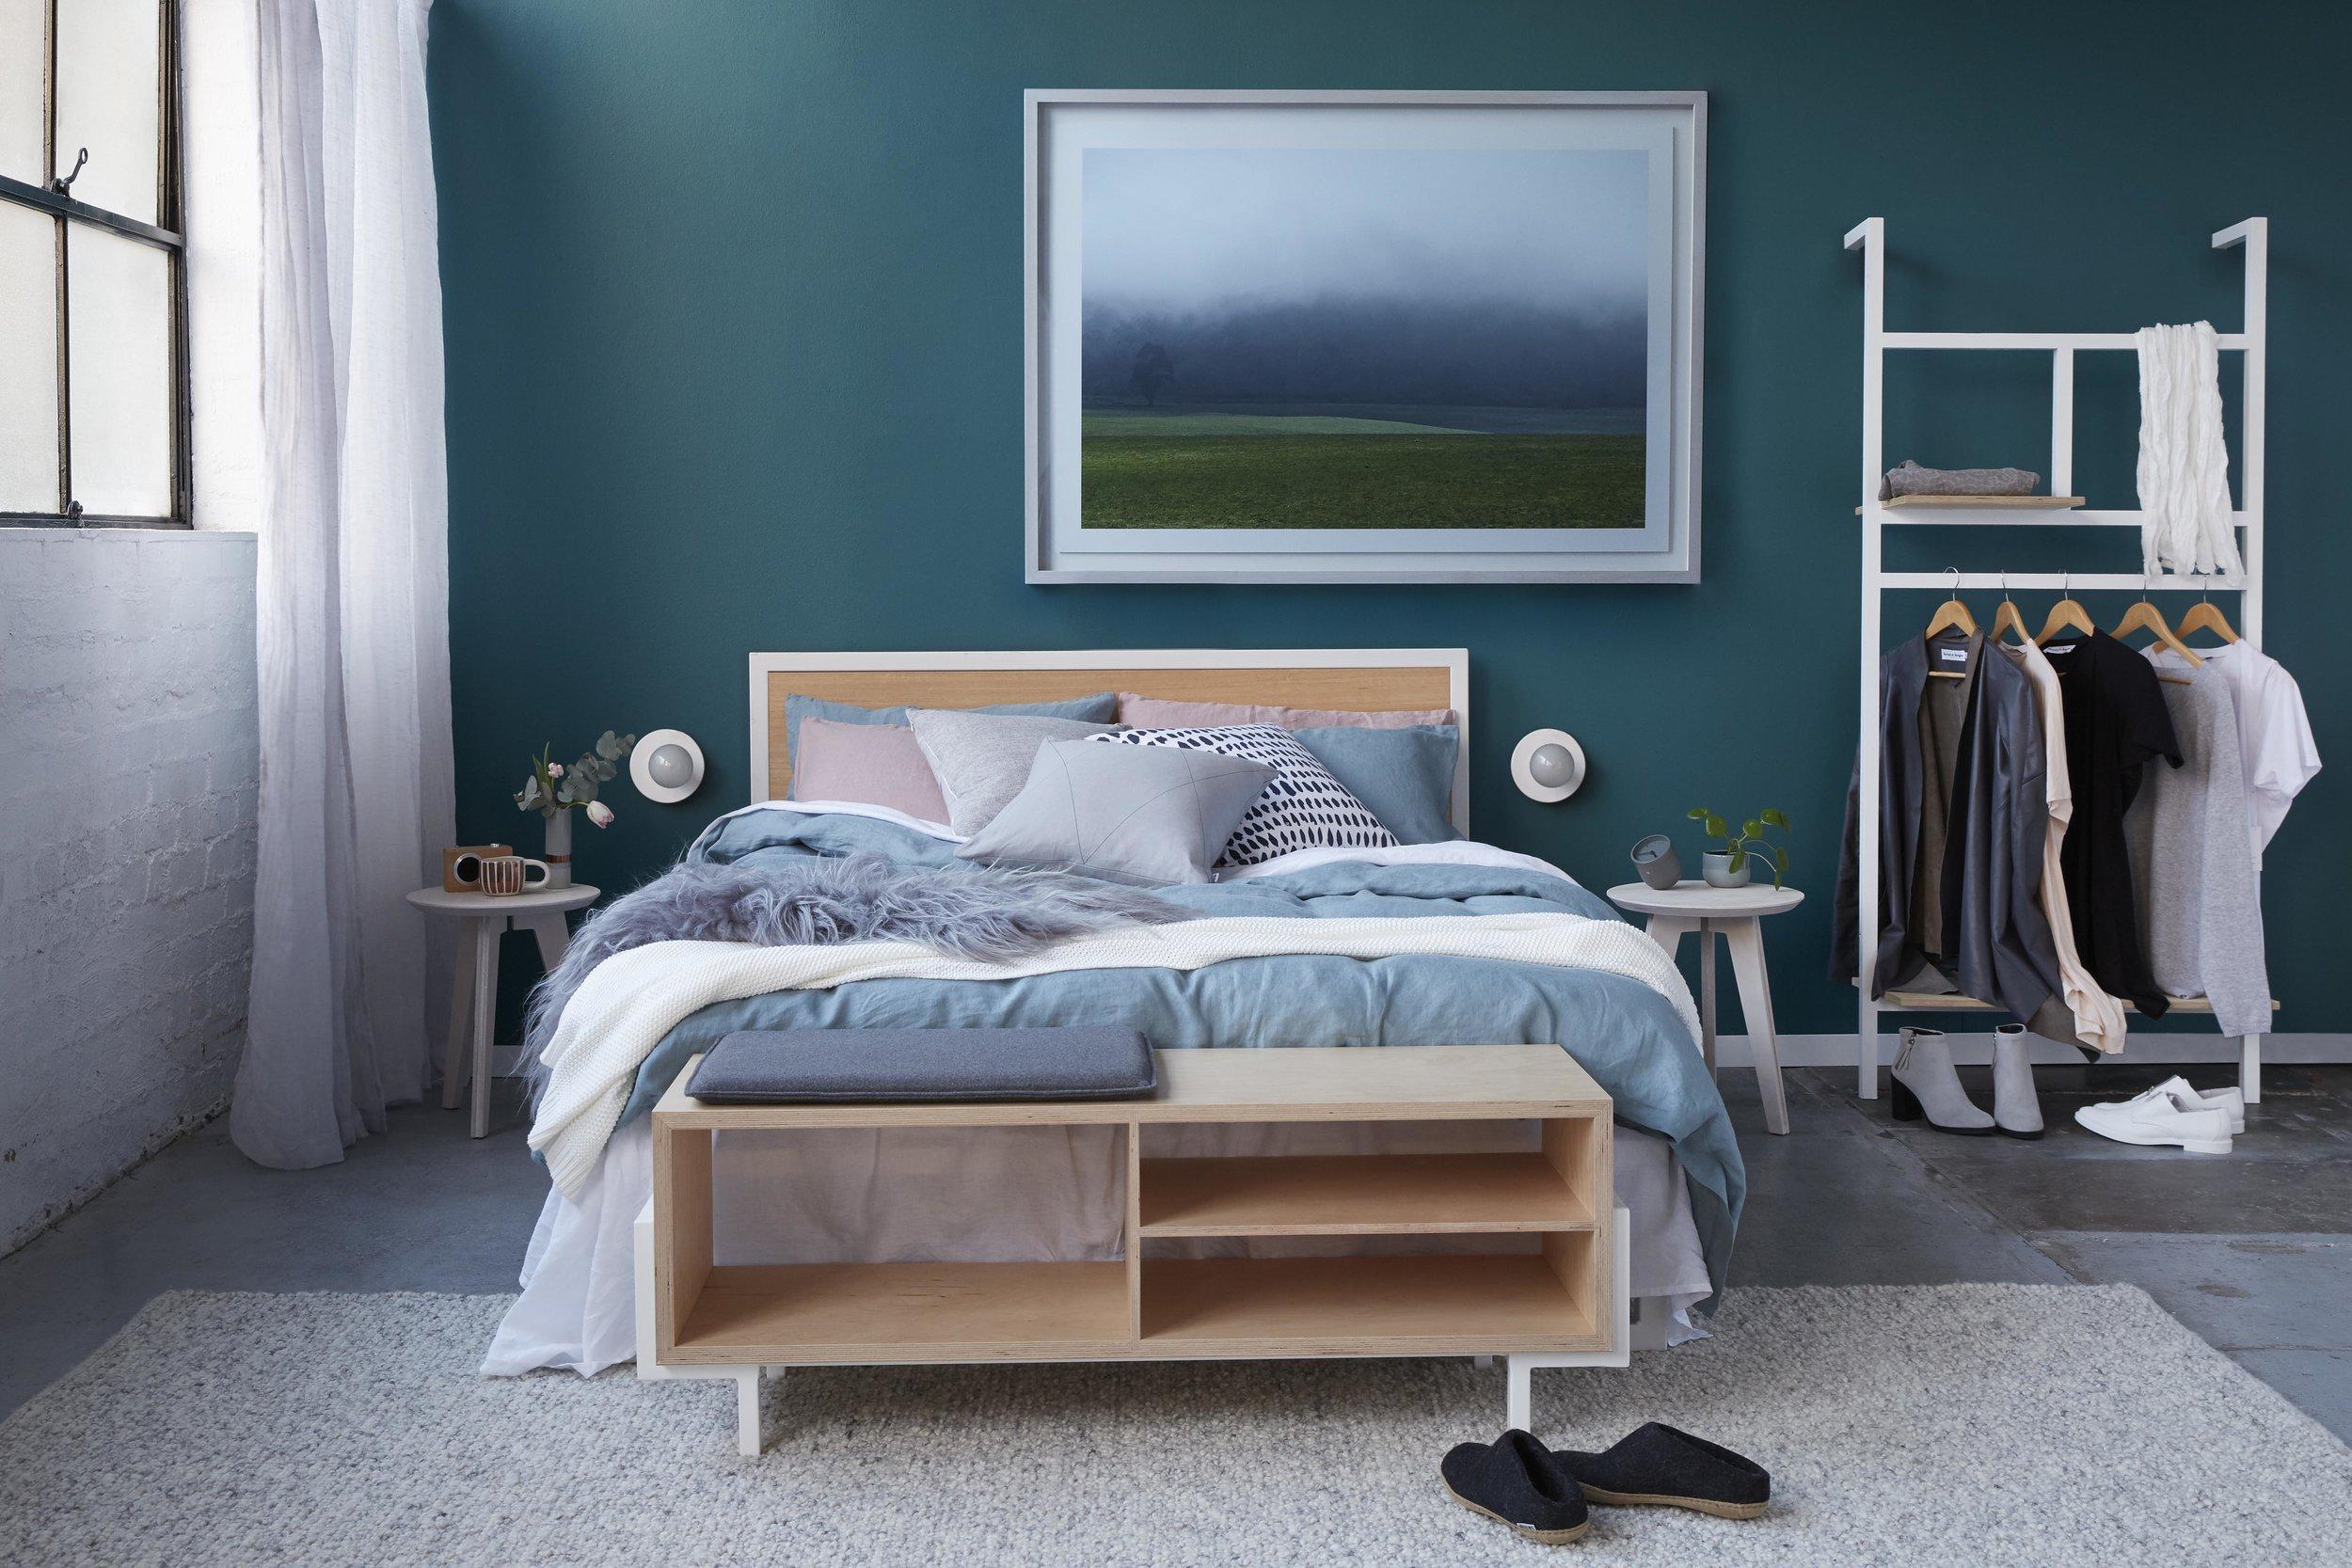 Maitland Street Interiors, Sarah Elshaug, Interior Stylist Melbourne, Felix Furniture Bedroom